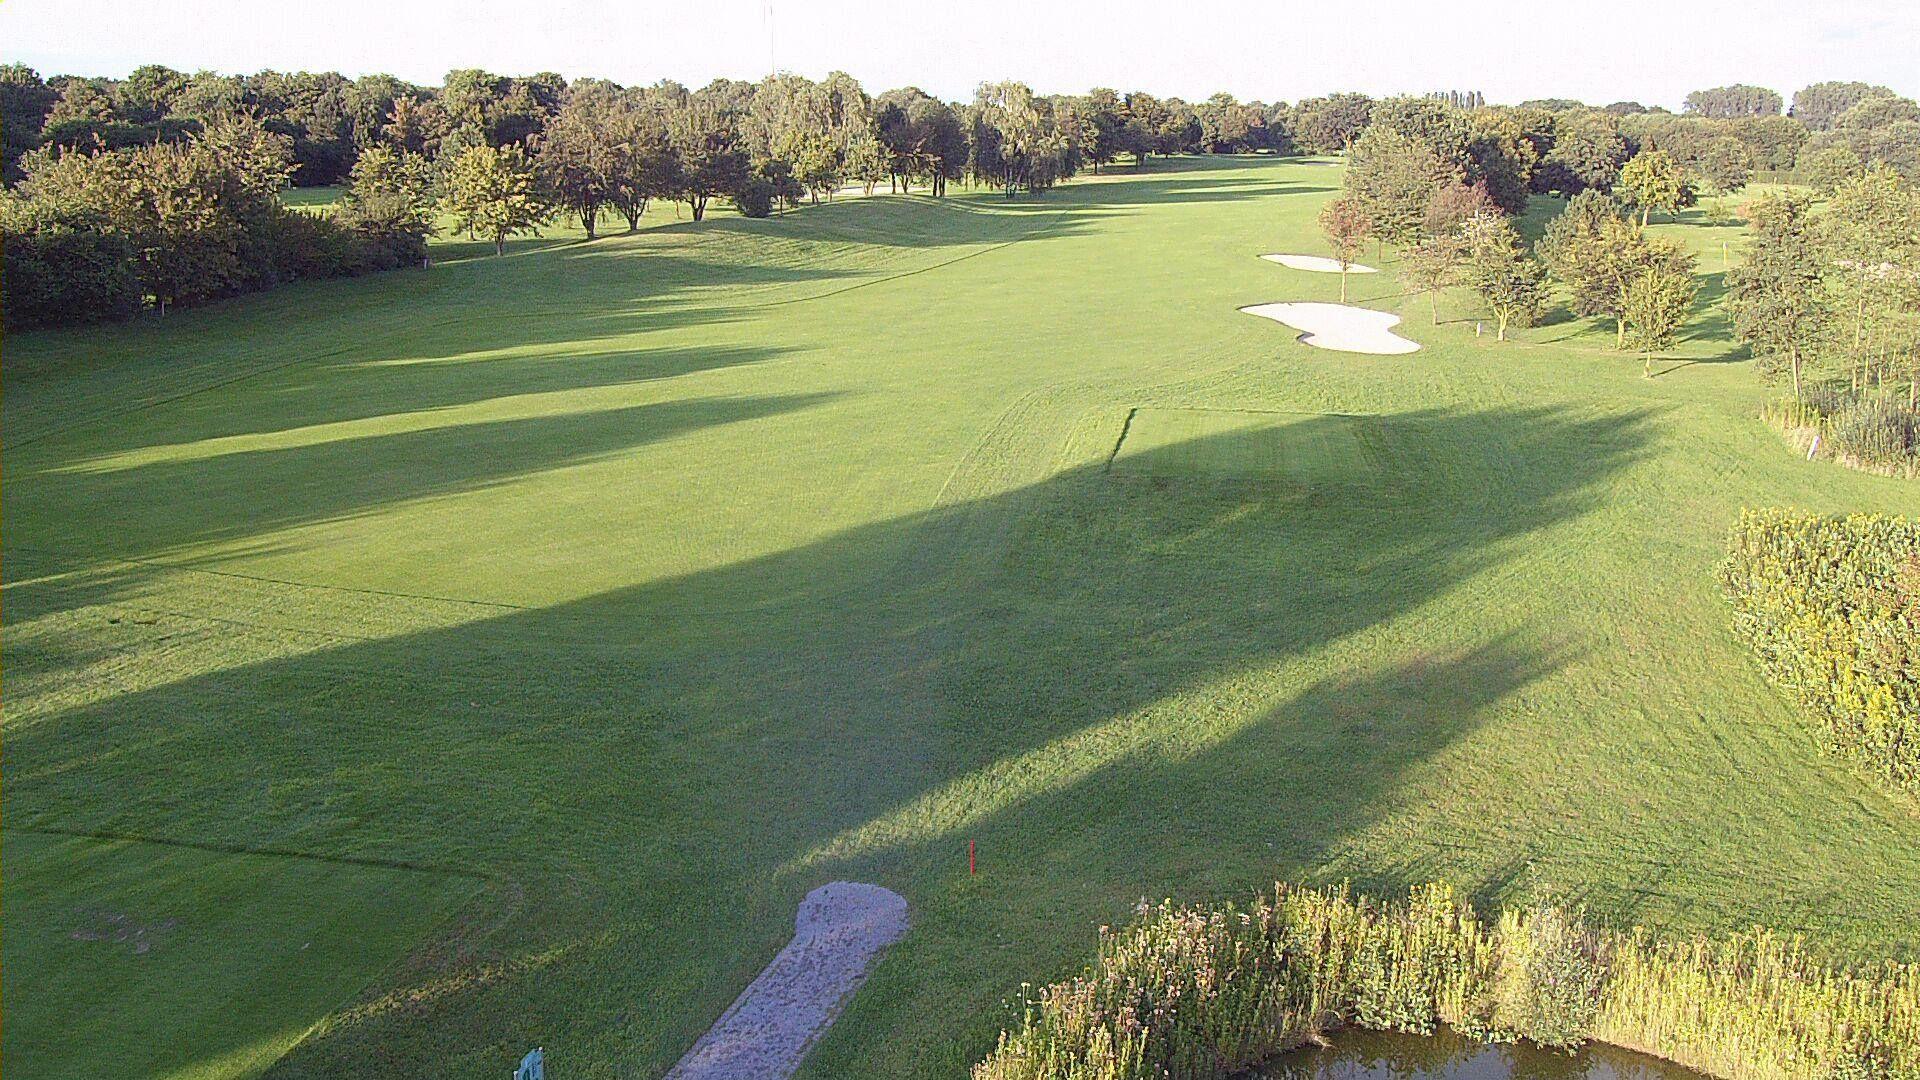 Golf club schwarze heide bottrop kirchhellen e v cover picture